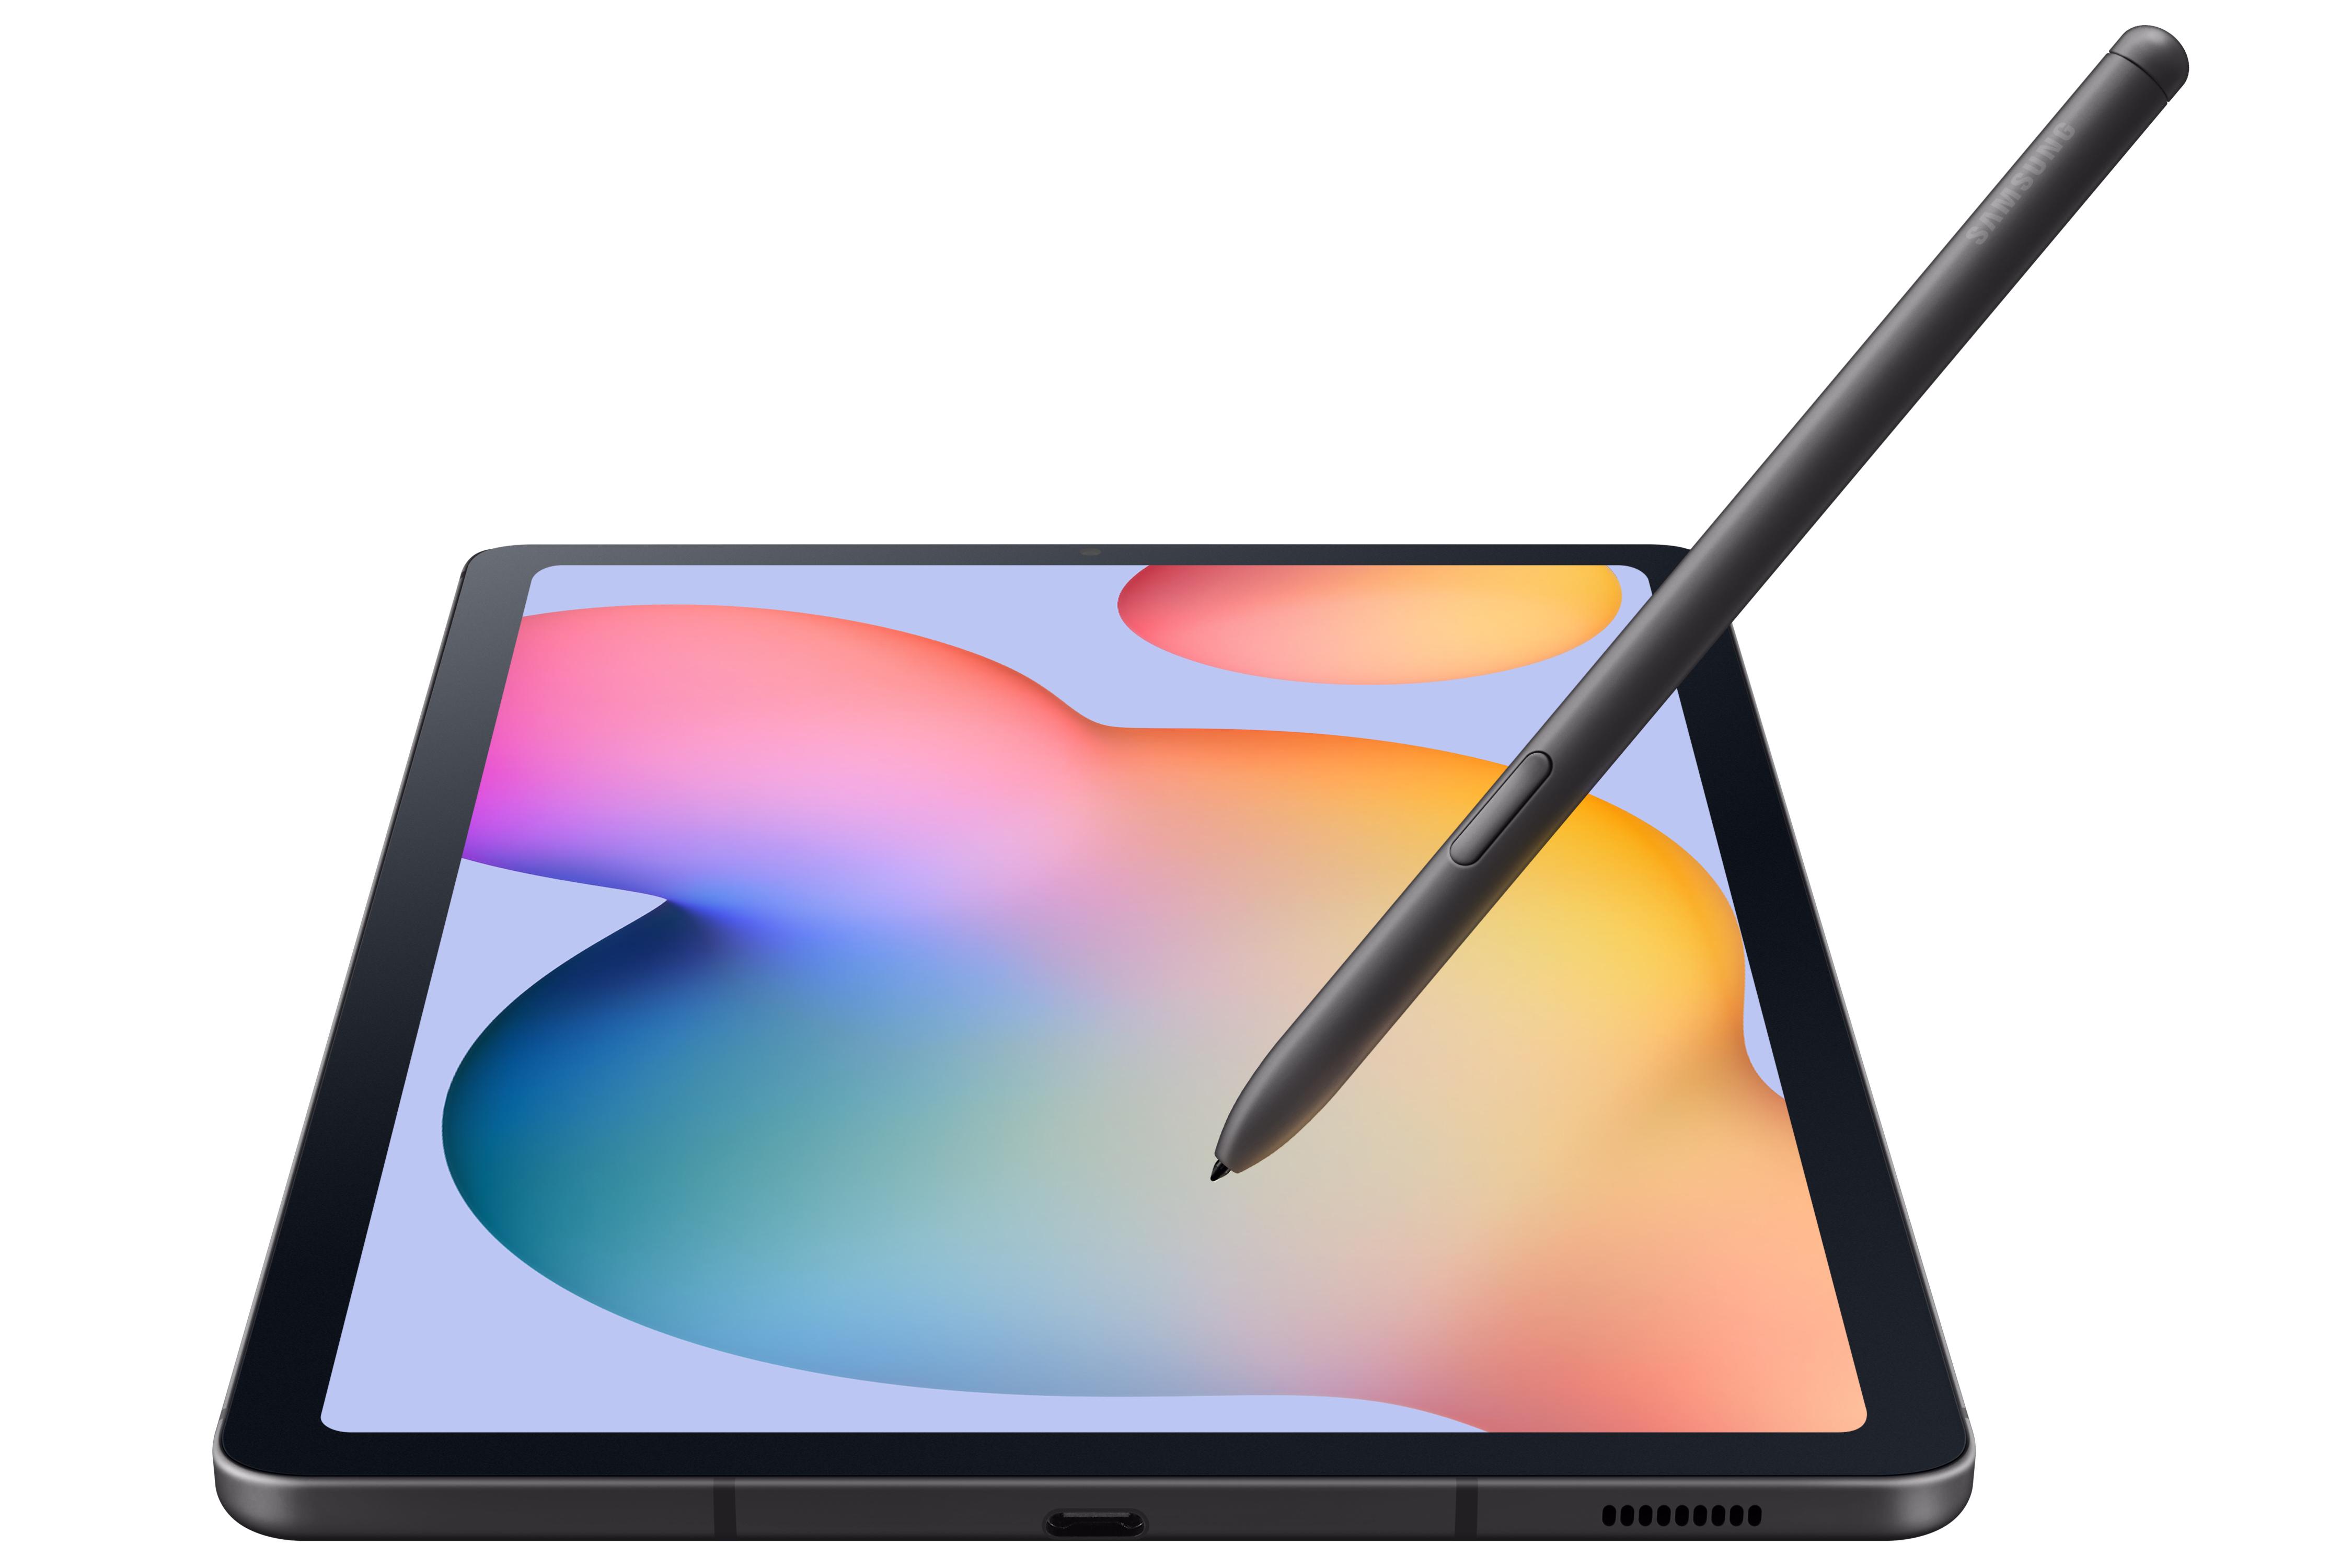 Galaxy Tab S6 Lite - 64 Go - Wifi + 4G - Oxford Gray